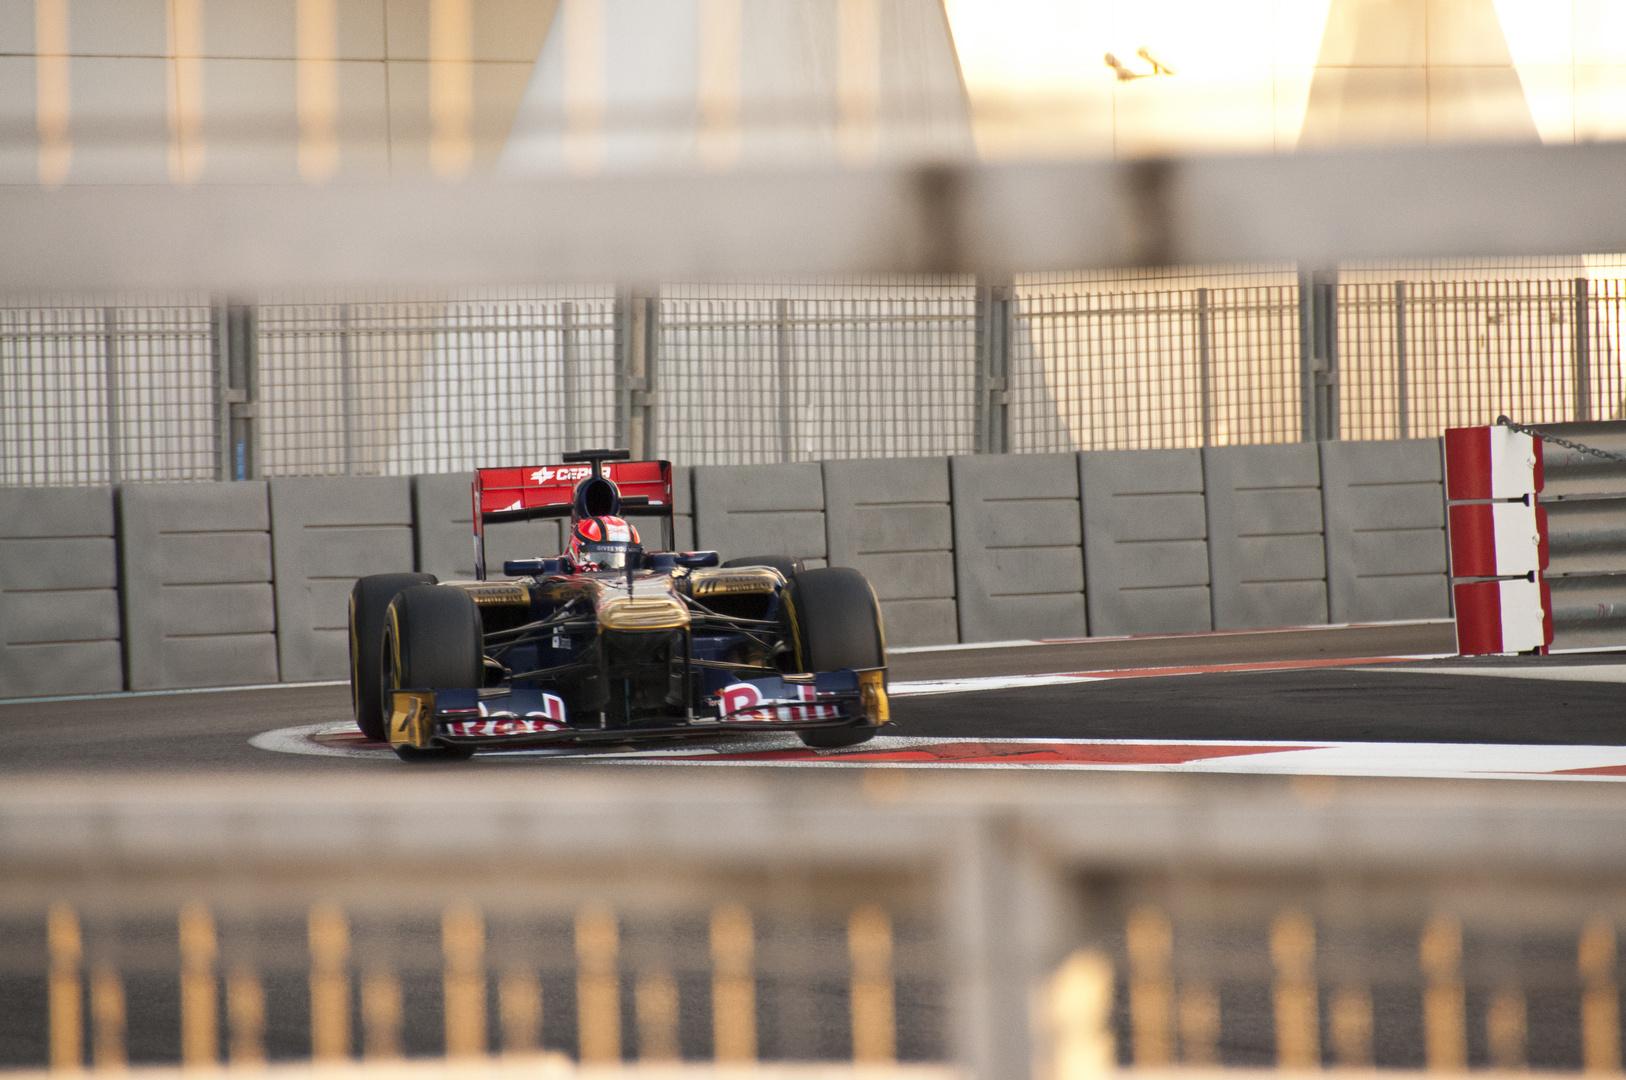 Toro Rosso in Abu Dhabi 2011